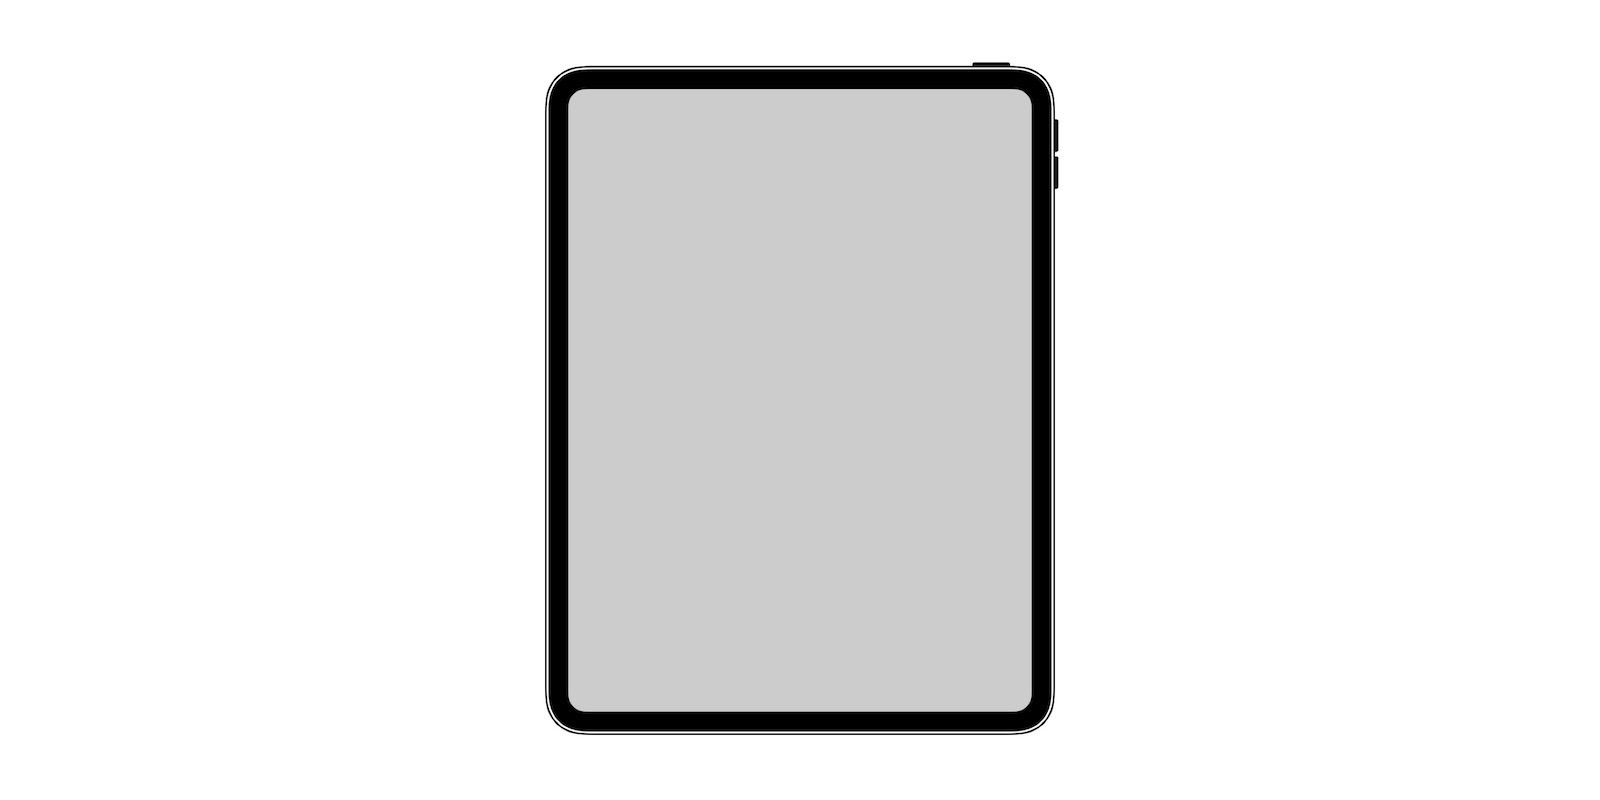 ipadpro2018-icon-found-again.jpg